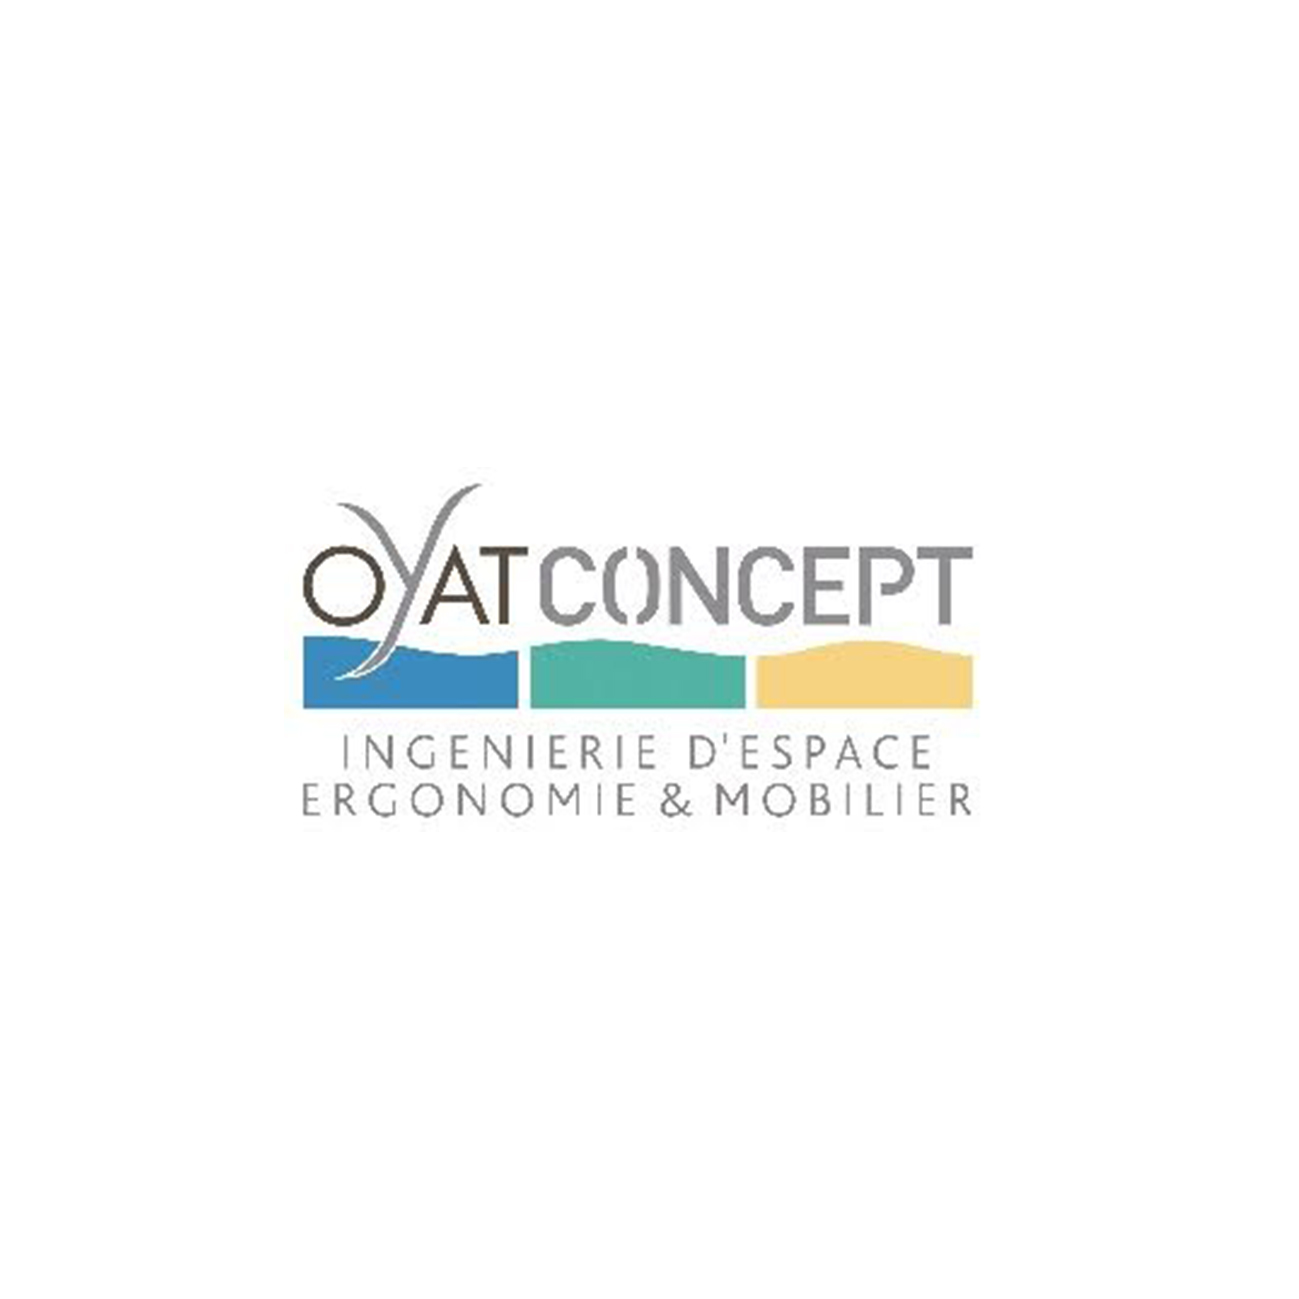 OYAT CONCEPT-logo